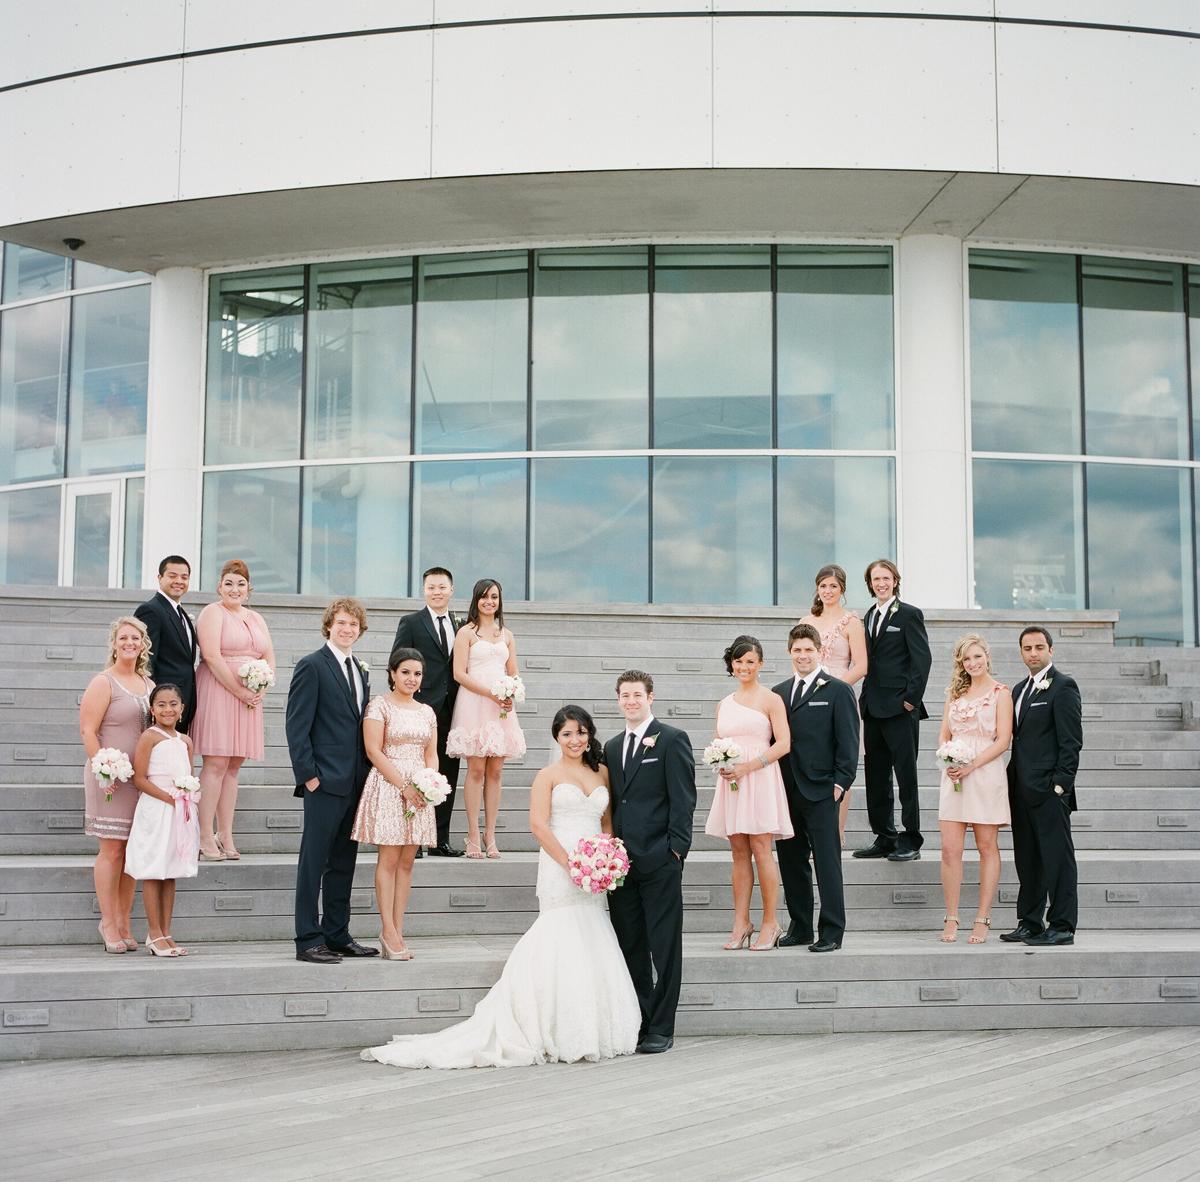 PIER WISCONSIN MILWAUKEE WEDDING | ZAINAB & MICHAEL! — The ...